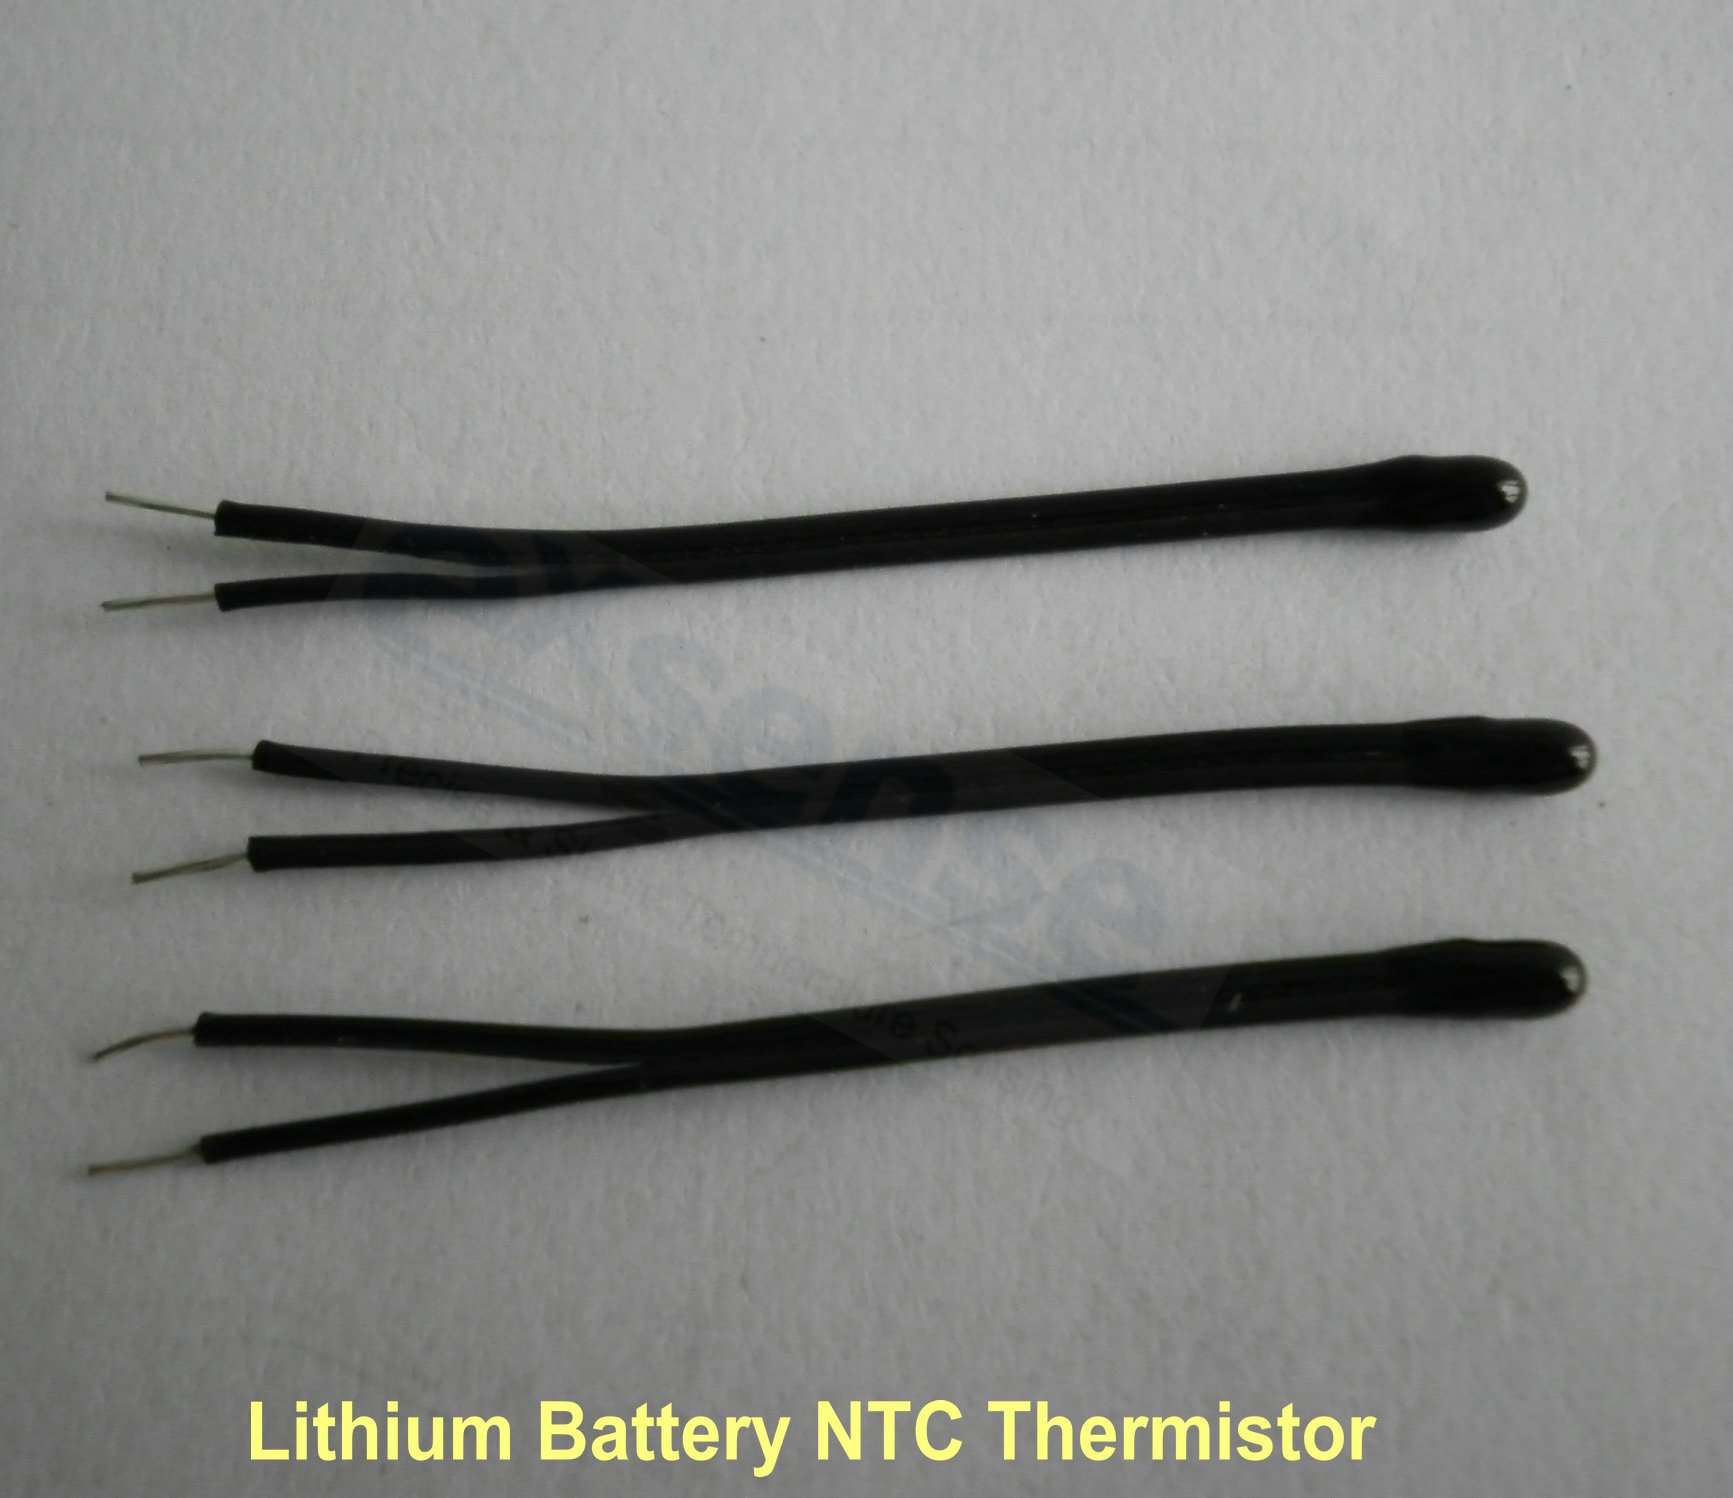 lithium battery ntc thermistor